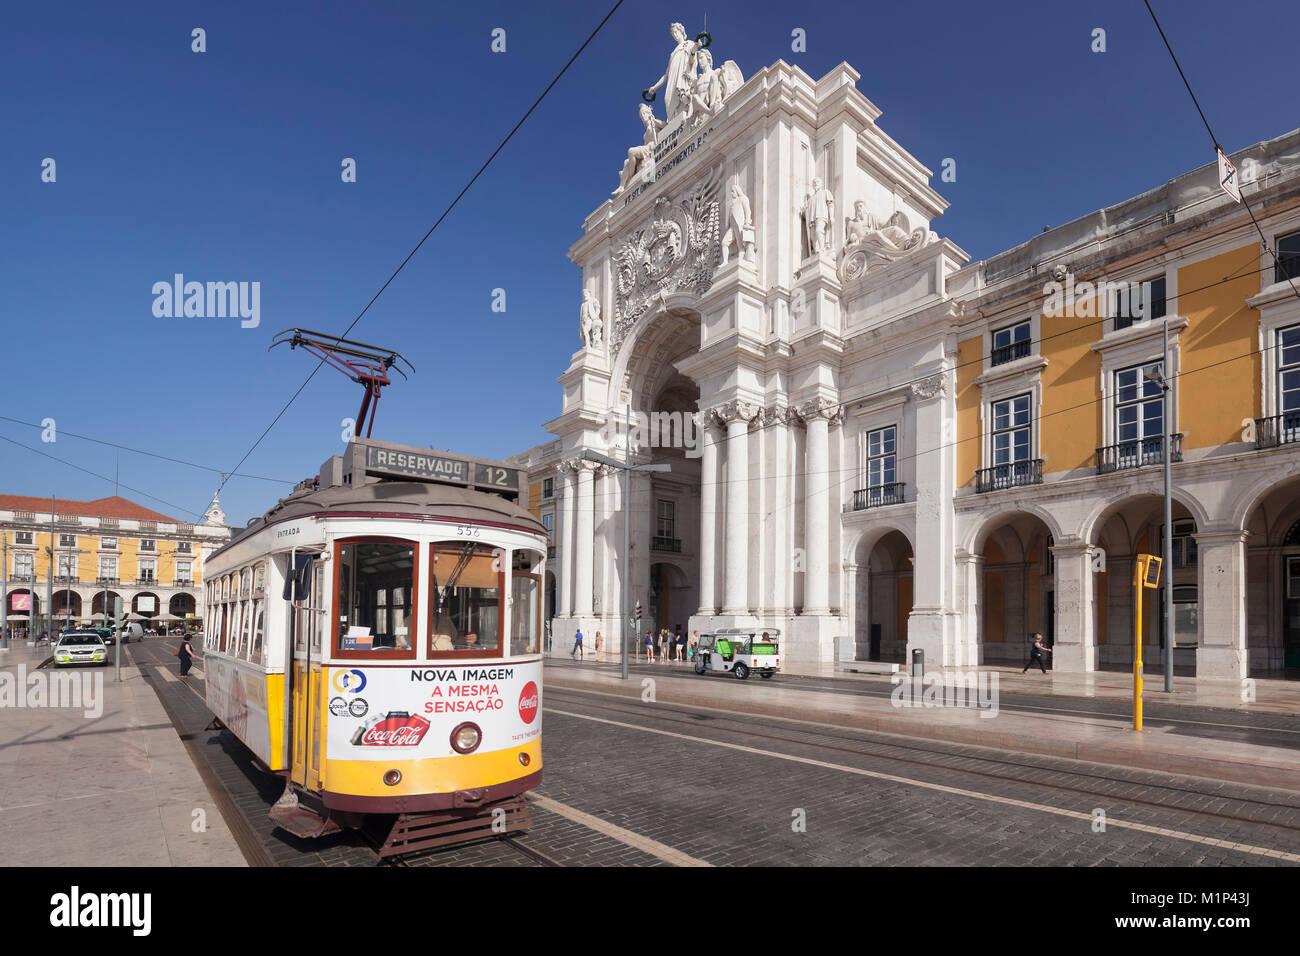 Tram, Arco da Rua Augusta arco trionfale, Praca do Comercio, Baixa, Lisbona, Portogallo, Europa Immagini Stock